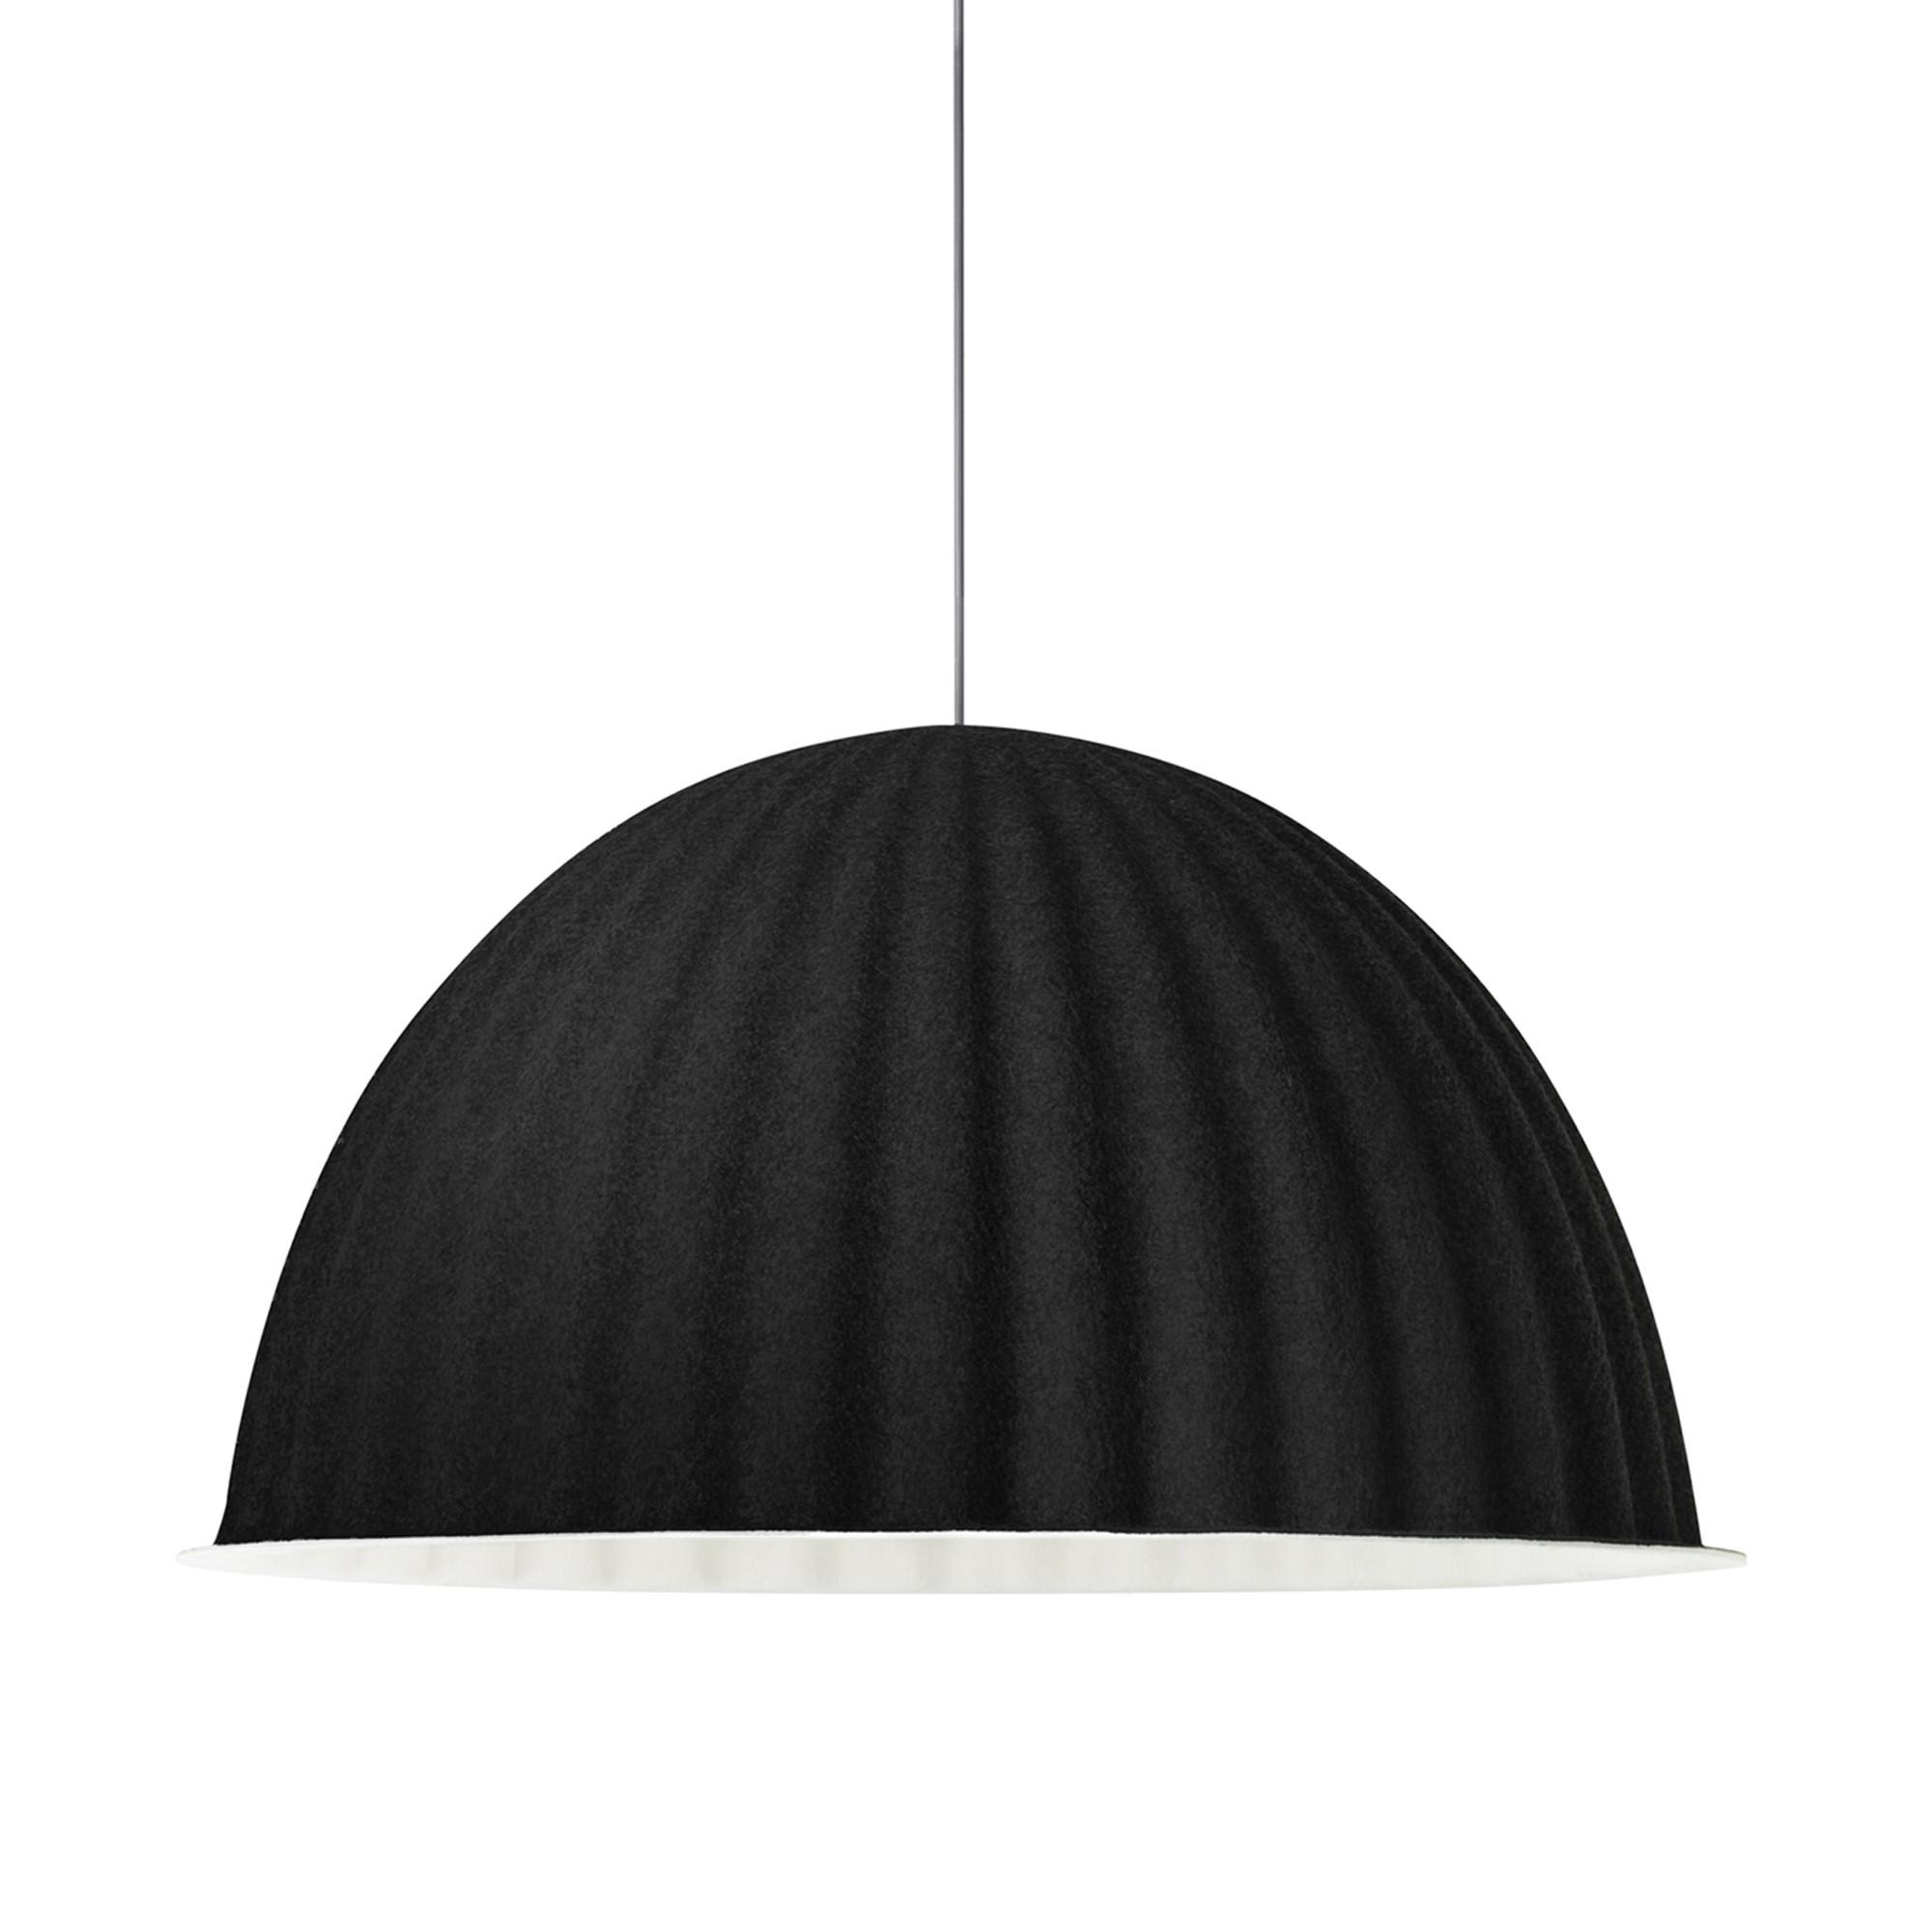 UNDER THE BELL pendant lamp in black acoustic felt - MUUTO